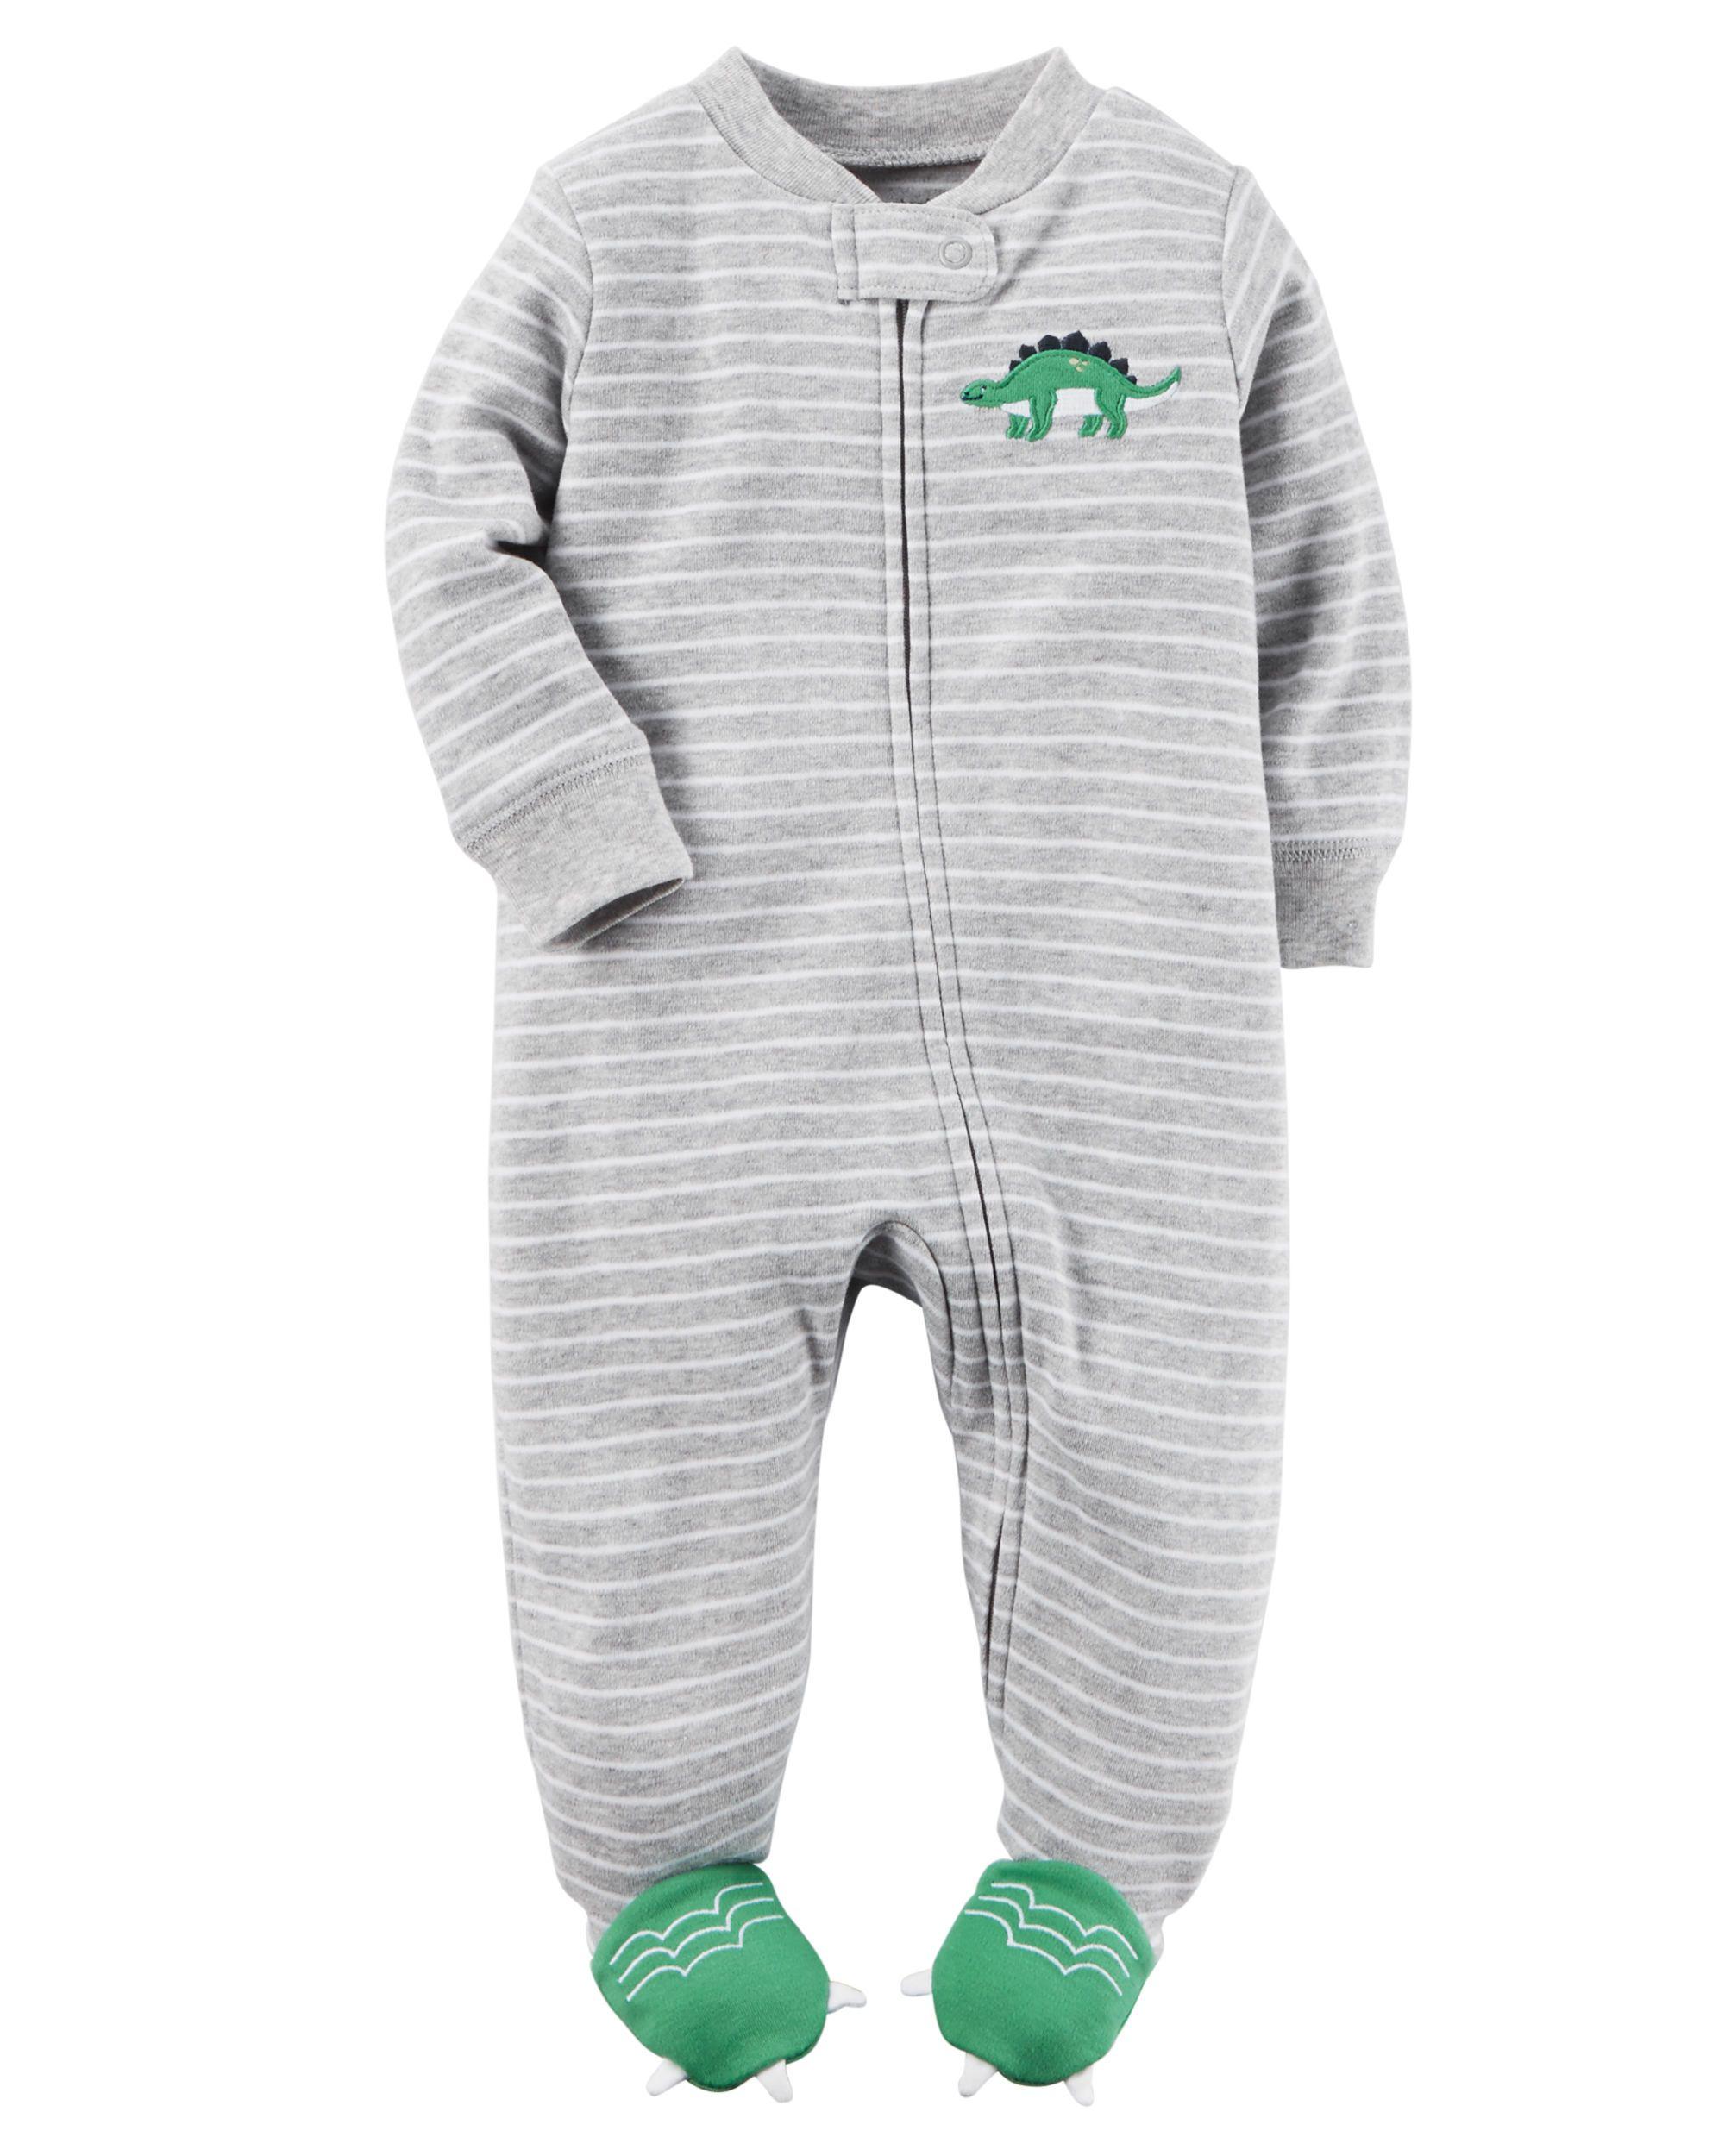 65a06f294 Baby Boy Cotton Zip-Up Sleep   Play